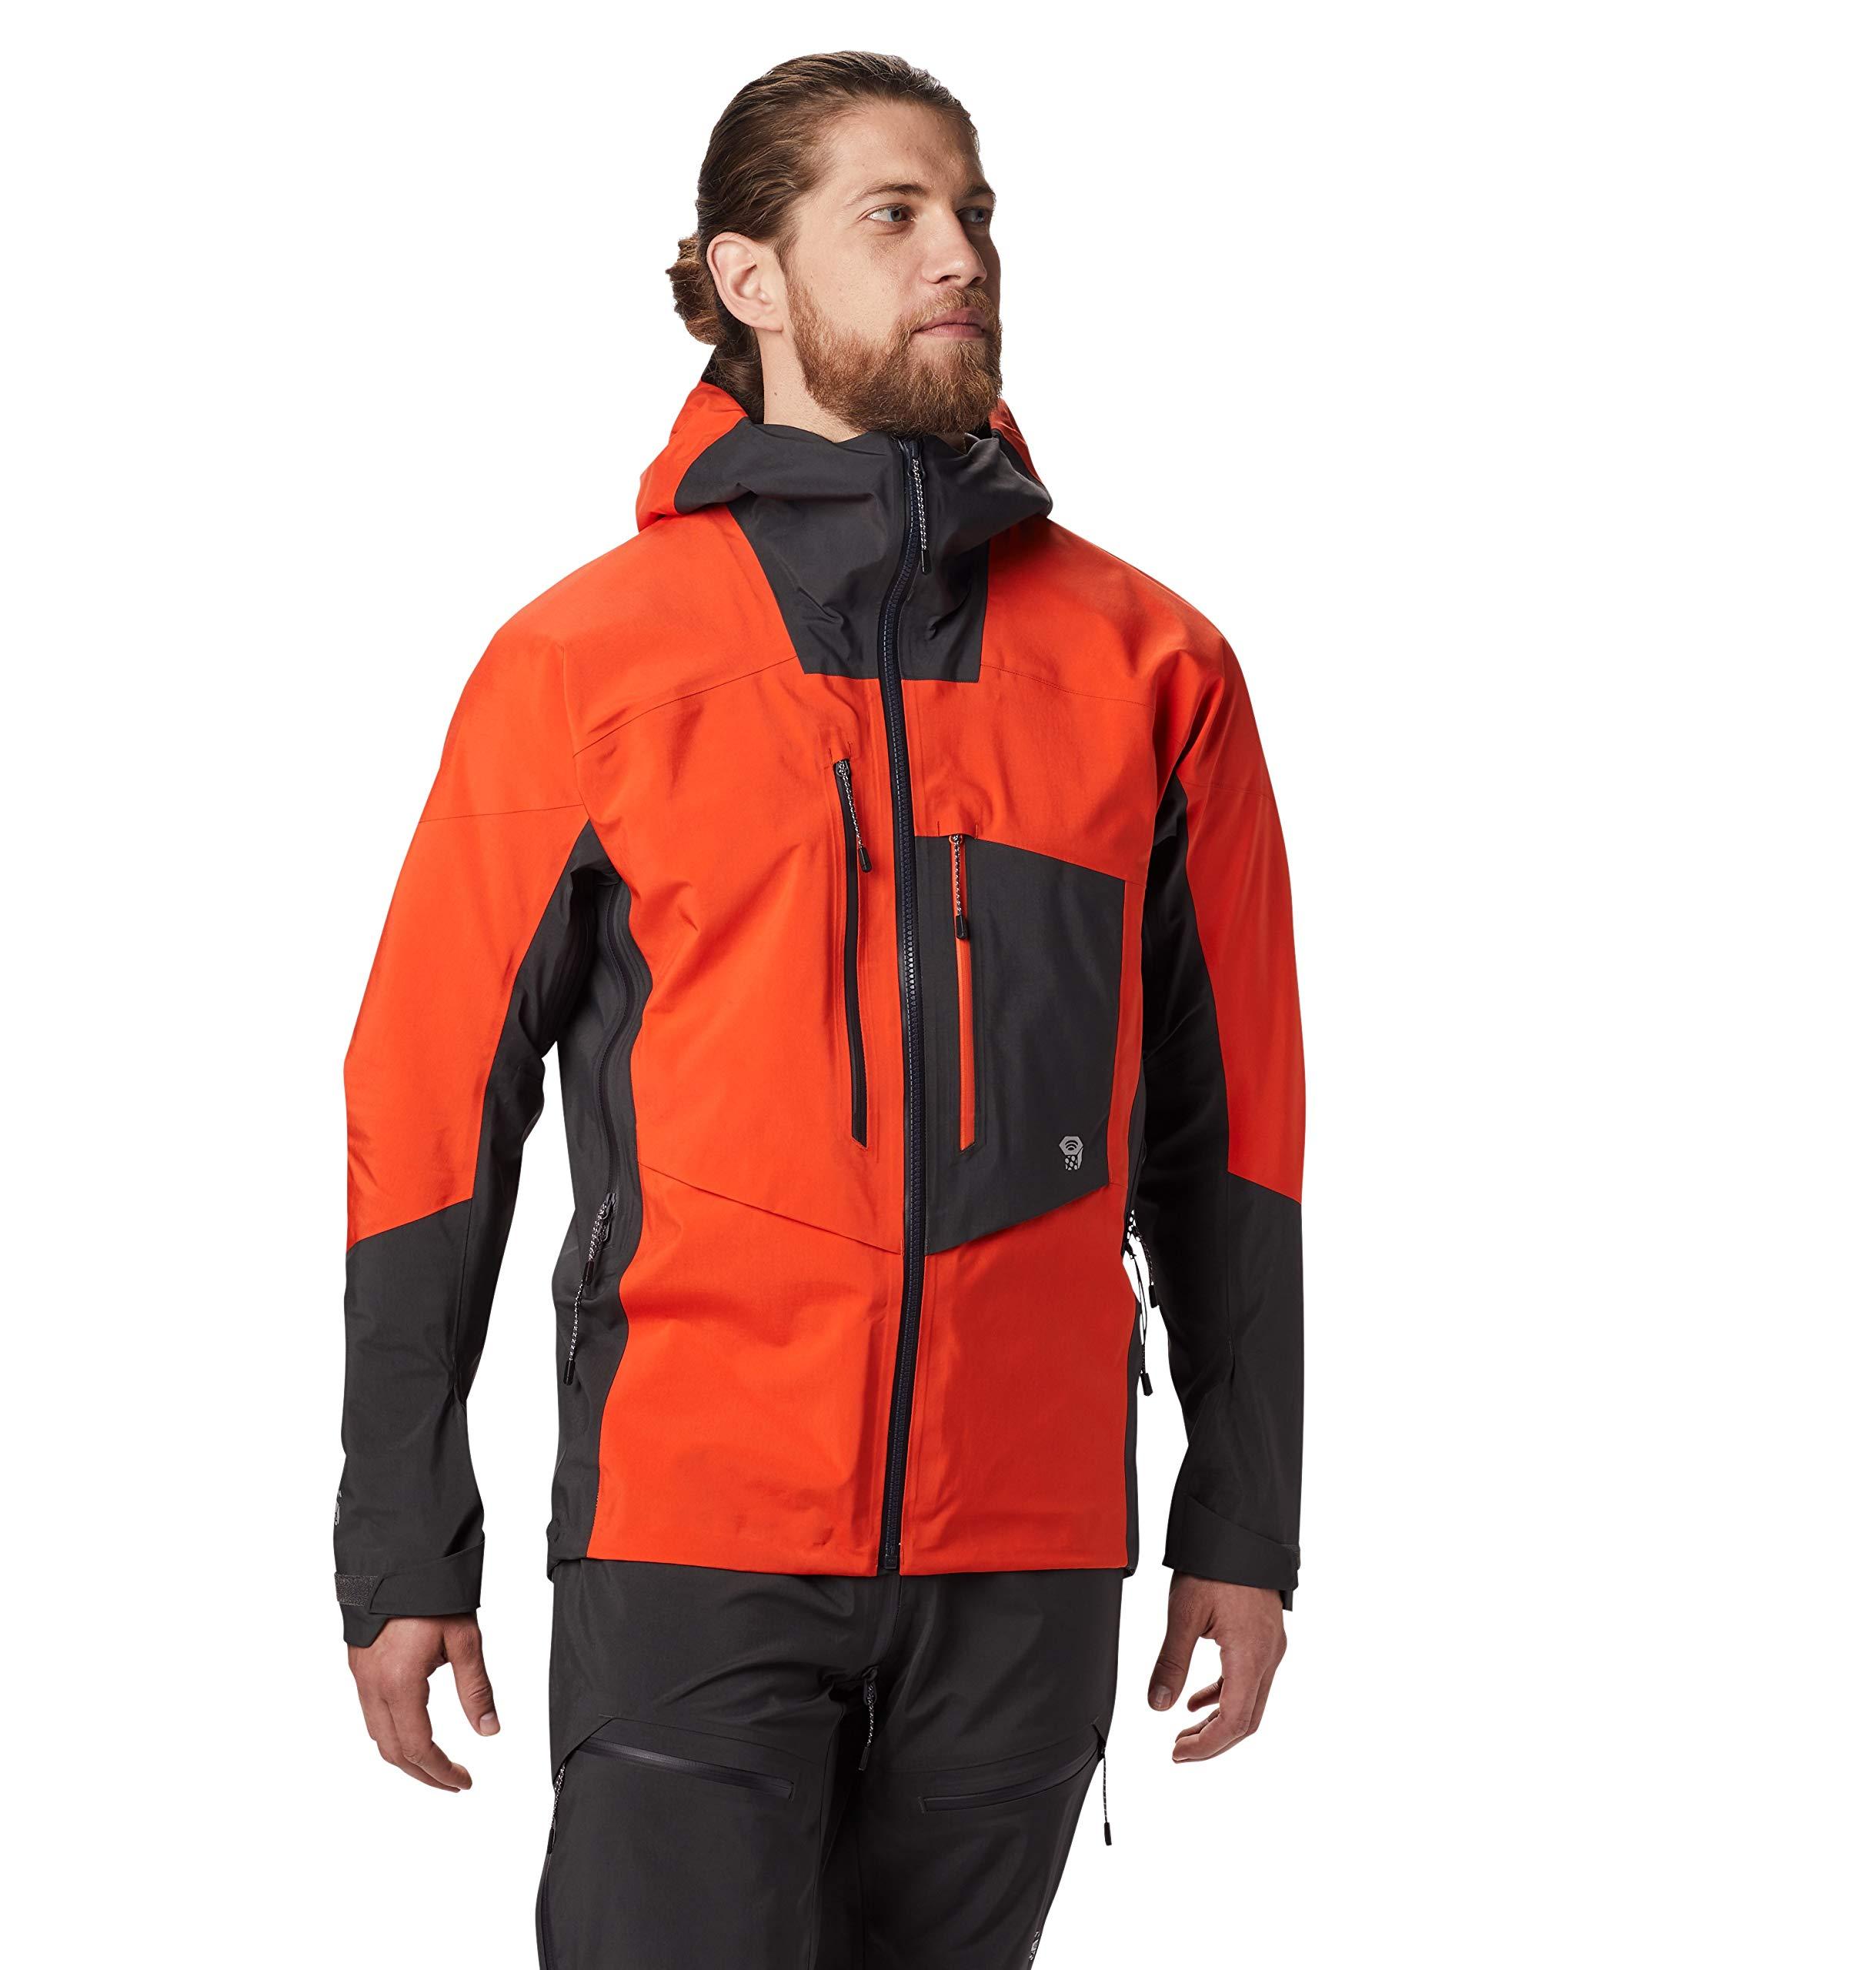 Mountain Hardwear Men's Exposure/2 Gore-TEX Pro Jacket